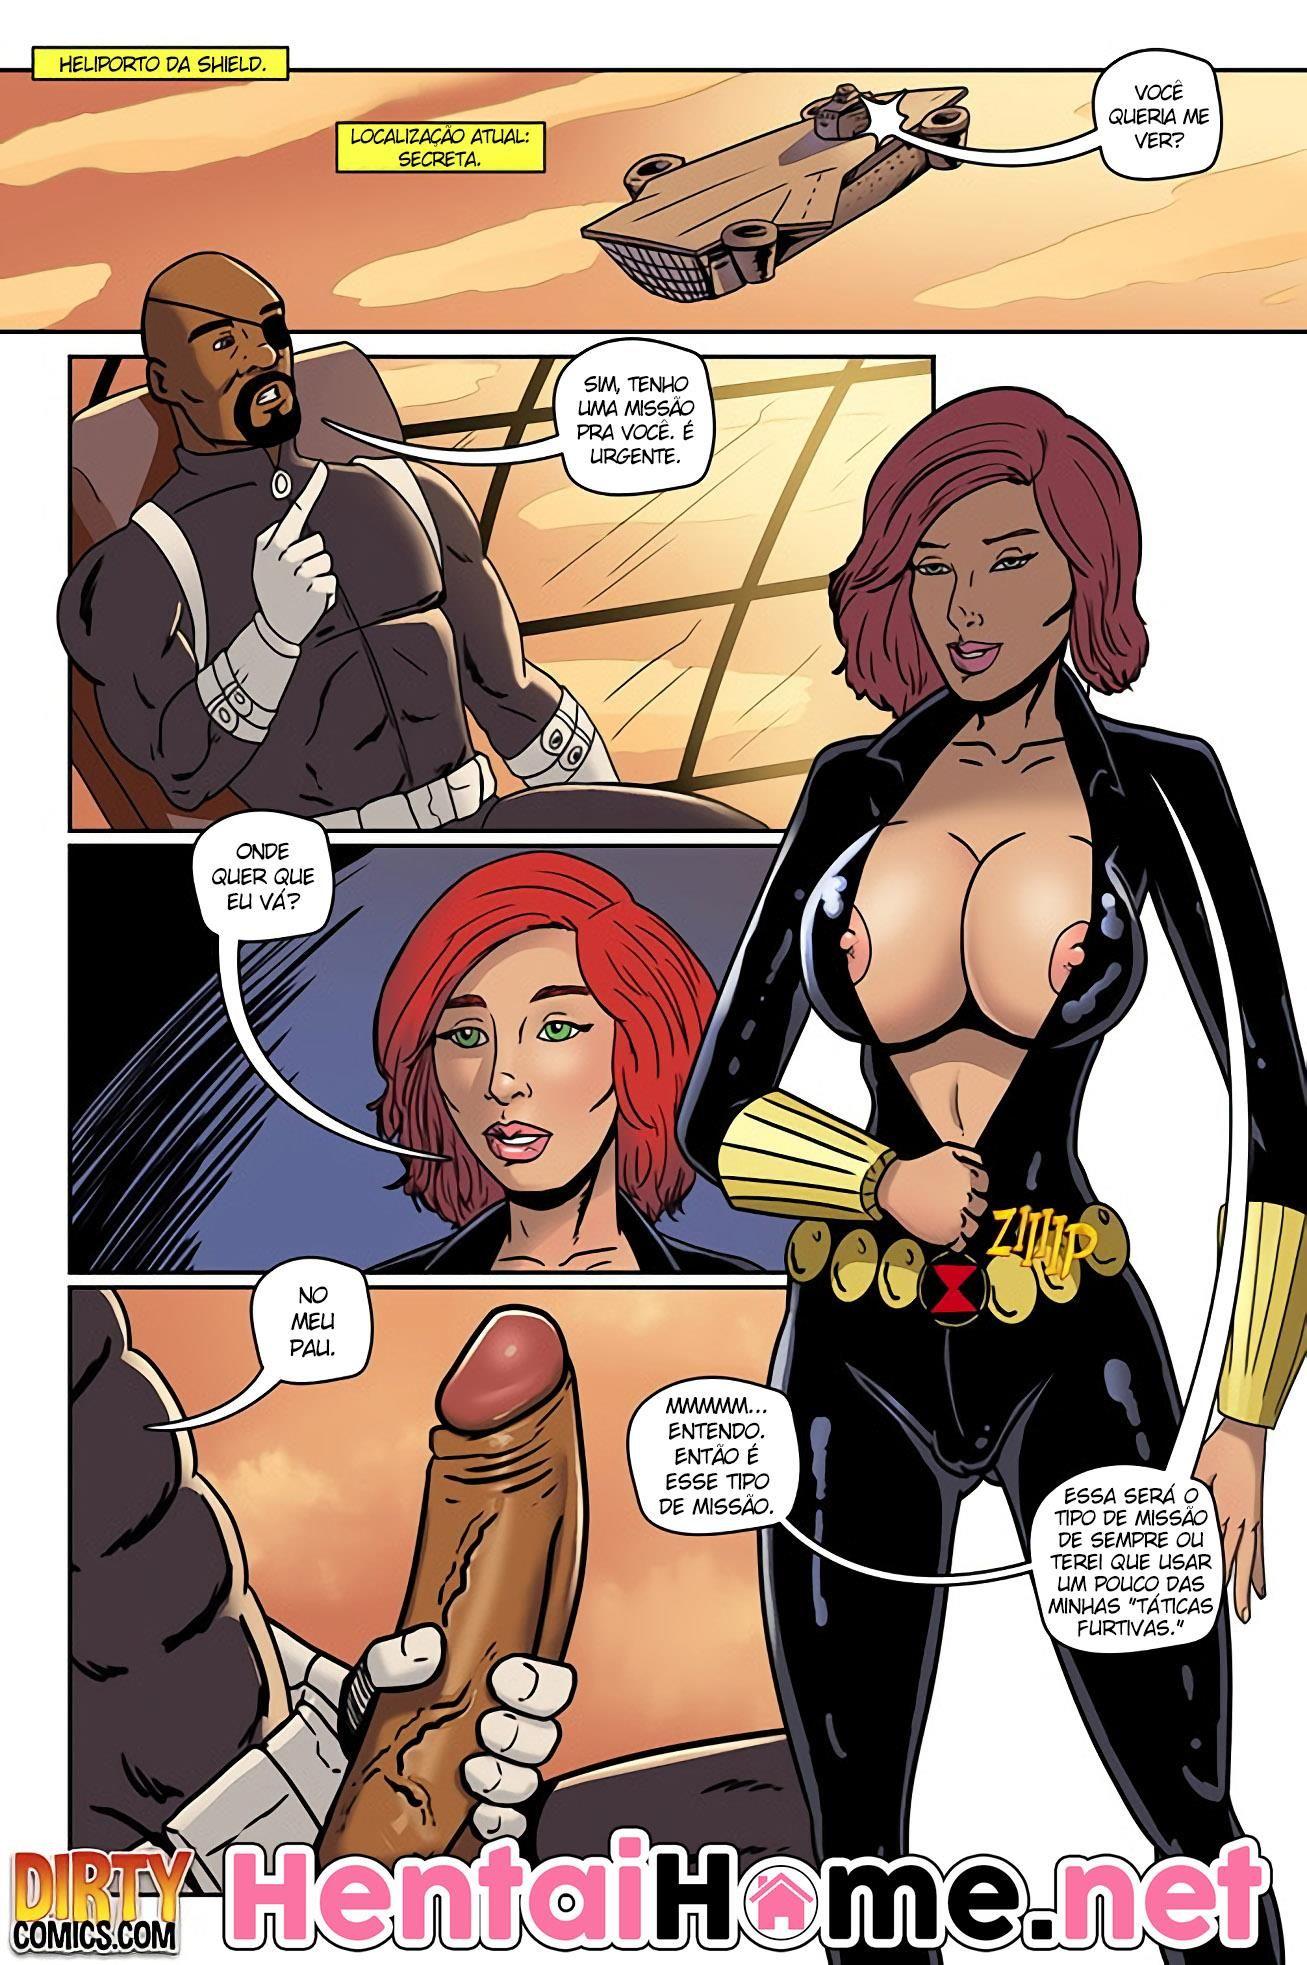 Missão secreta anal da Viúva Negra